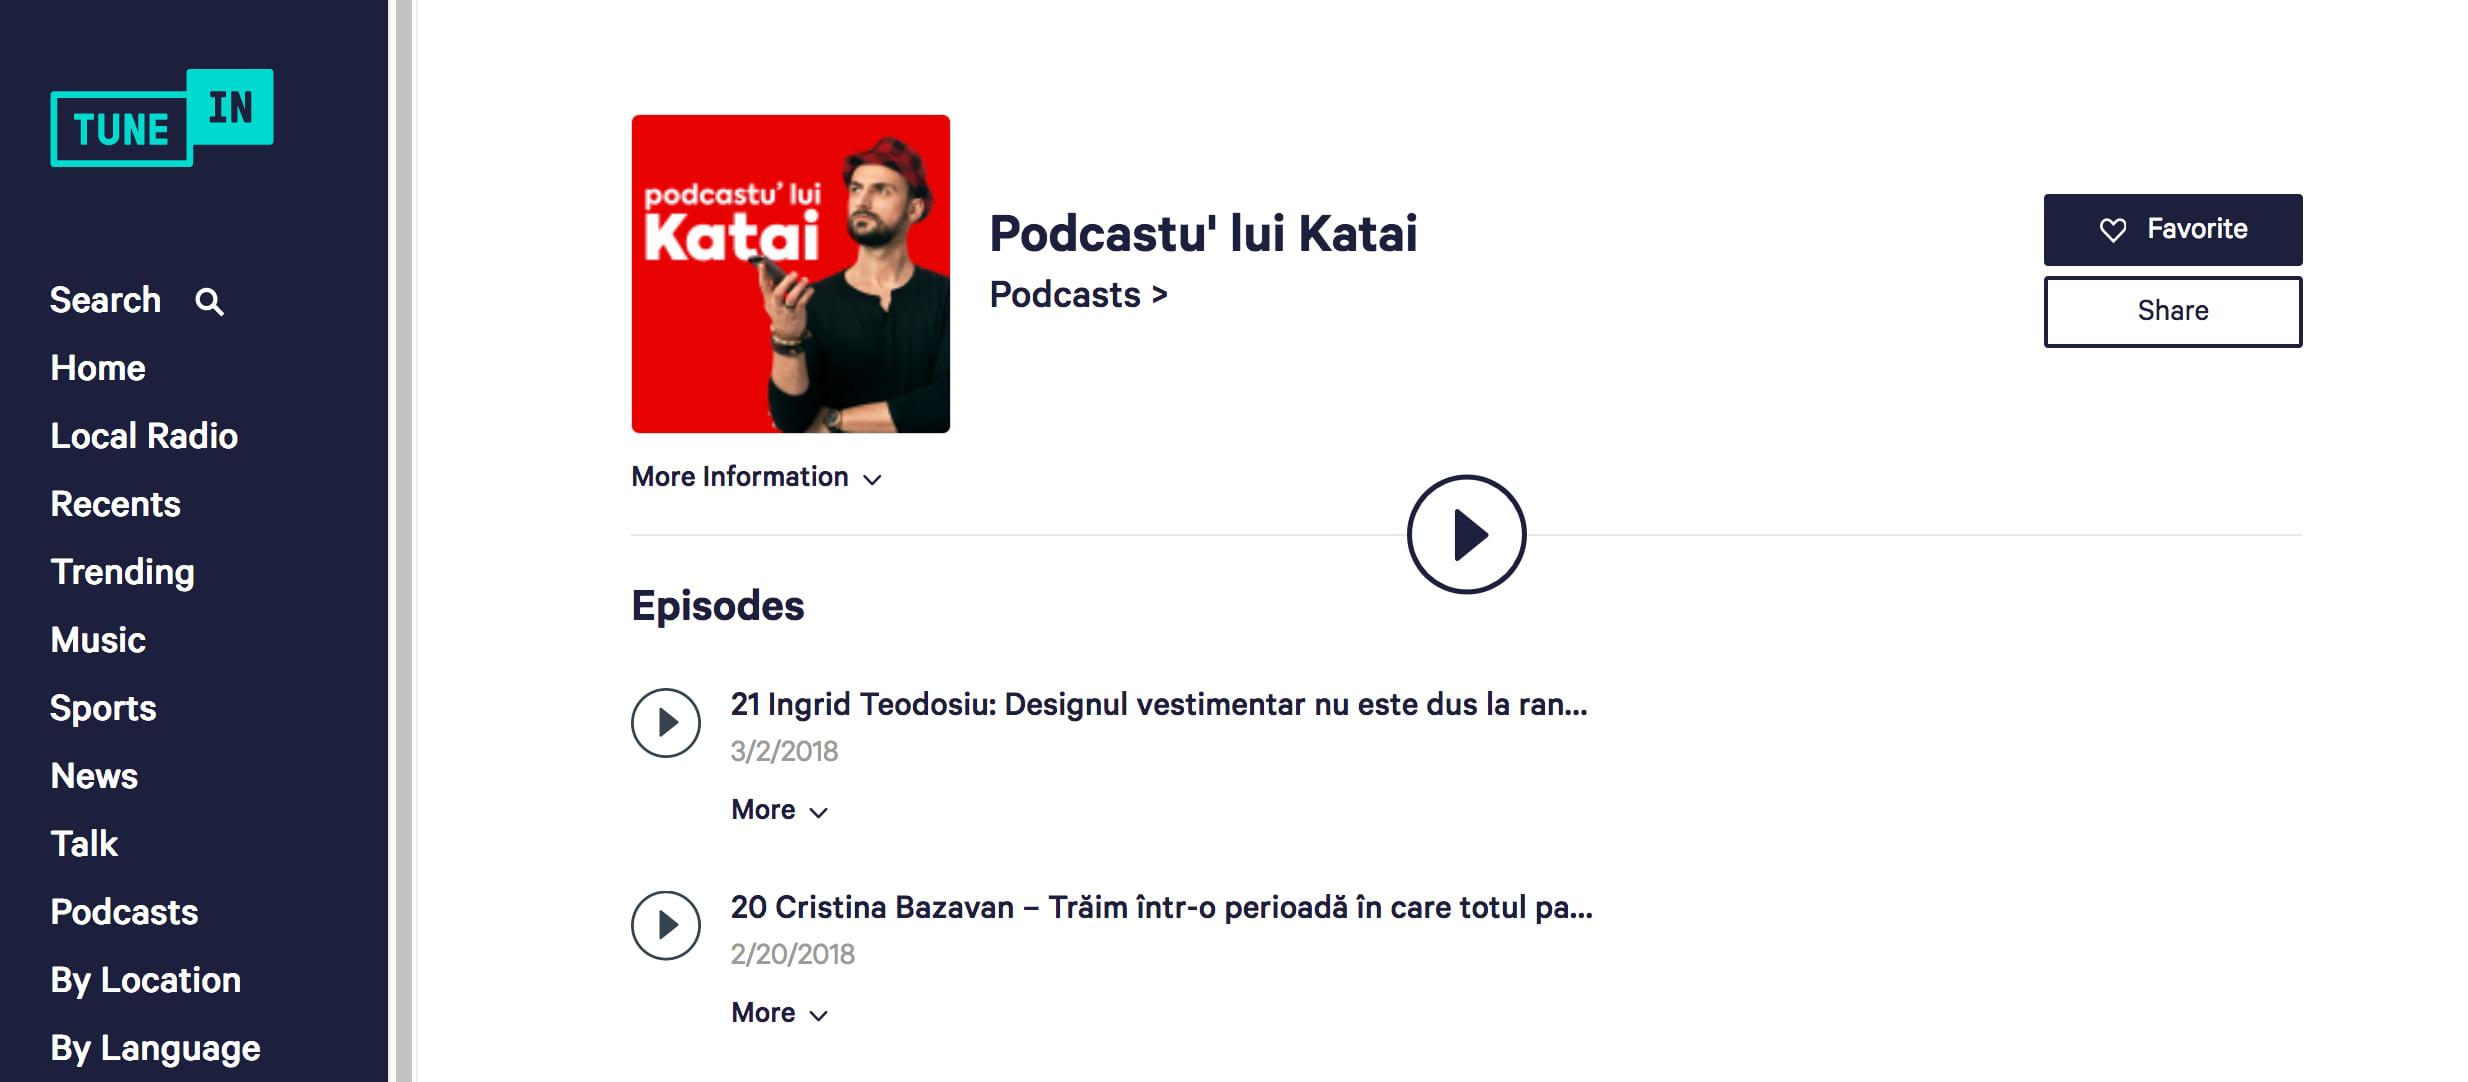 tunein podcastu' lui katai